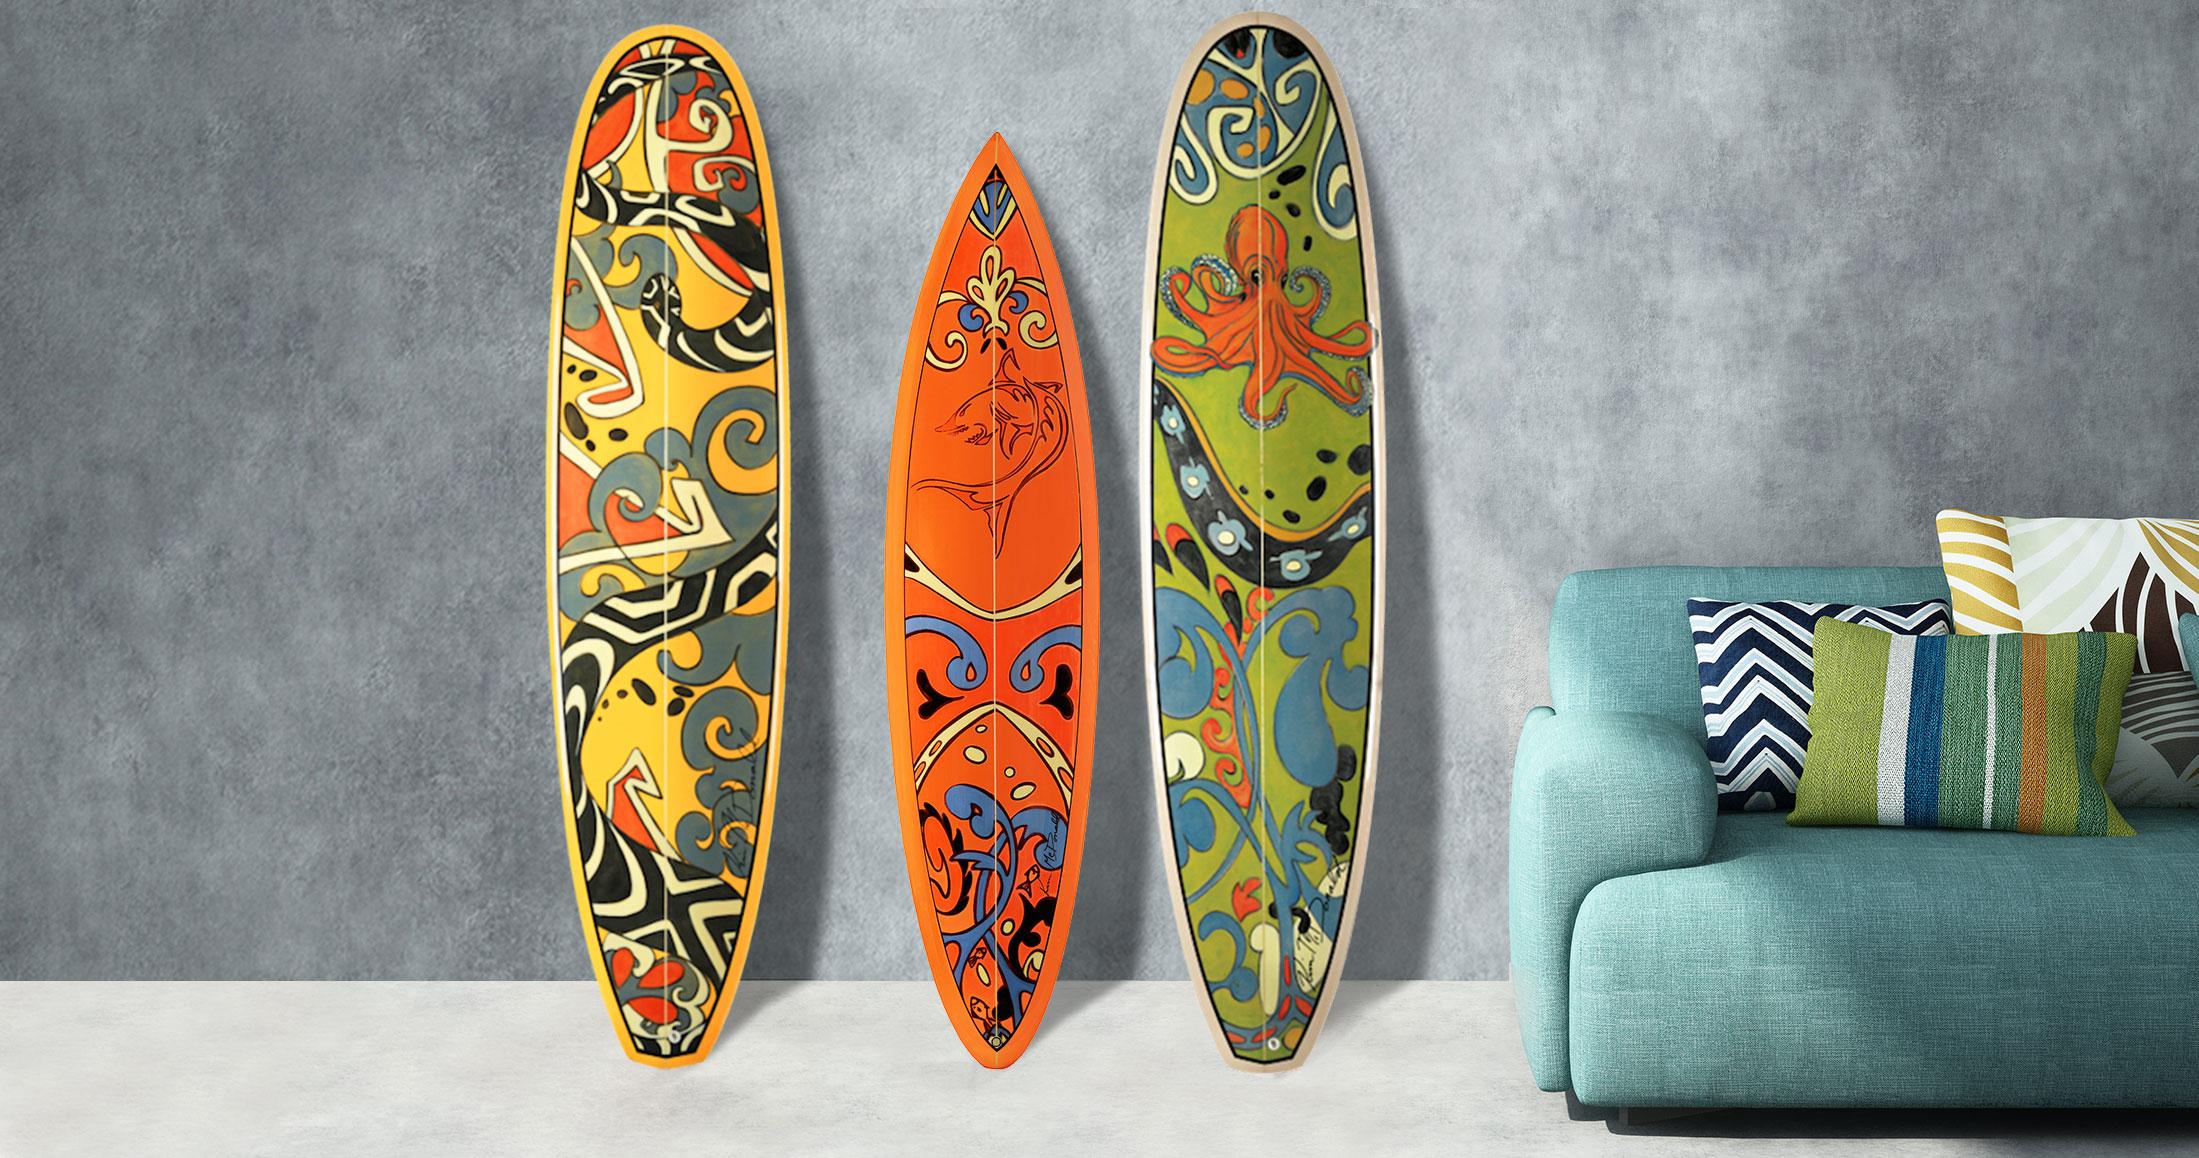 kim-interiors-boards-couch.jpg